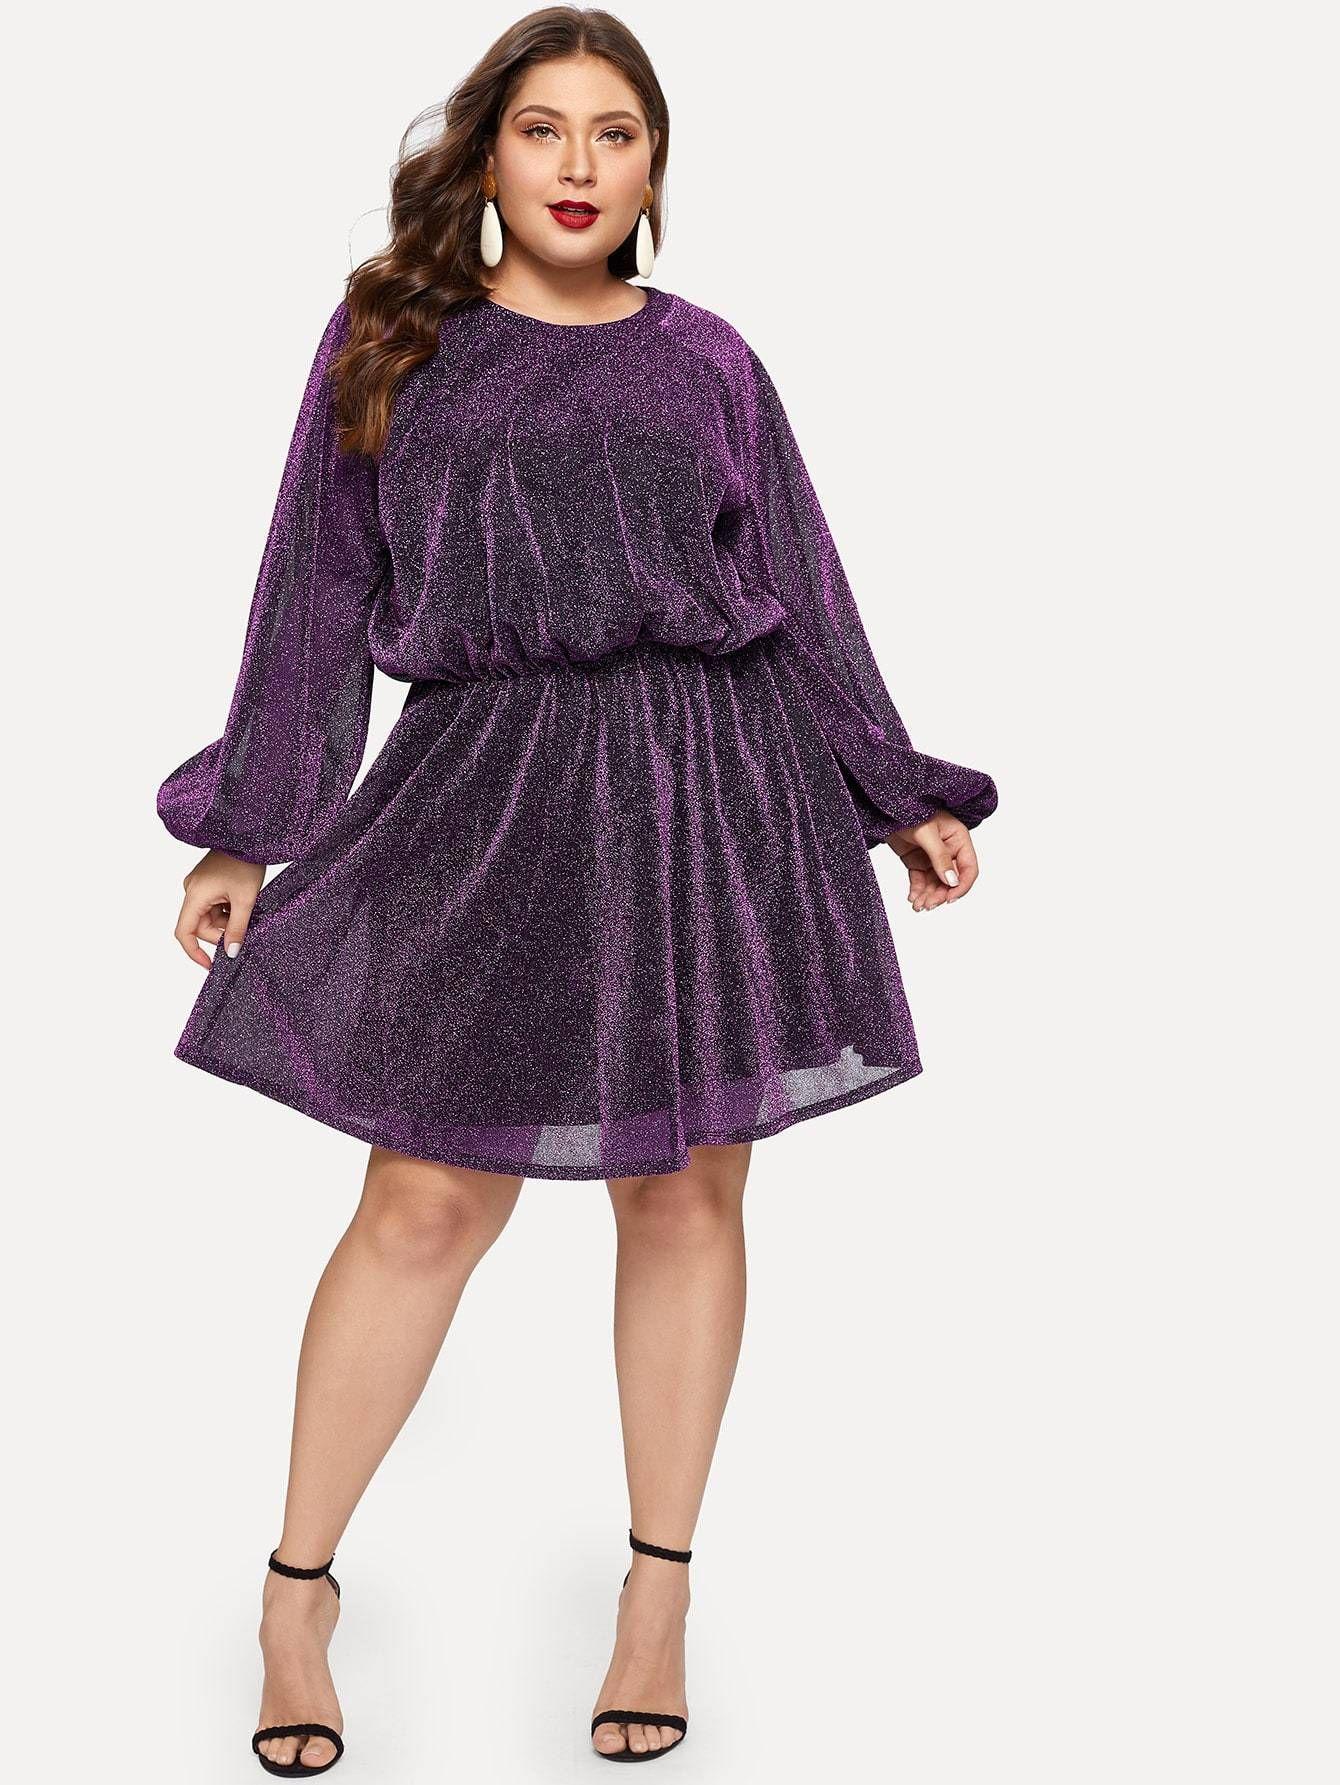 ef5d1bdd6e Plus Bishop Sleeve Split Back Glitter Mesh Dress - purple #ootd #onsale  #onlineshop #styleblogger #boutique #fashionblog #inspiration #chic  #boutiquefashion ...